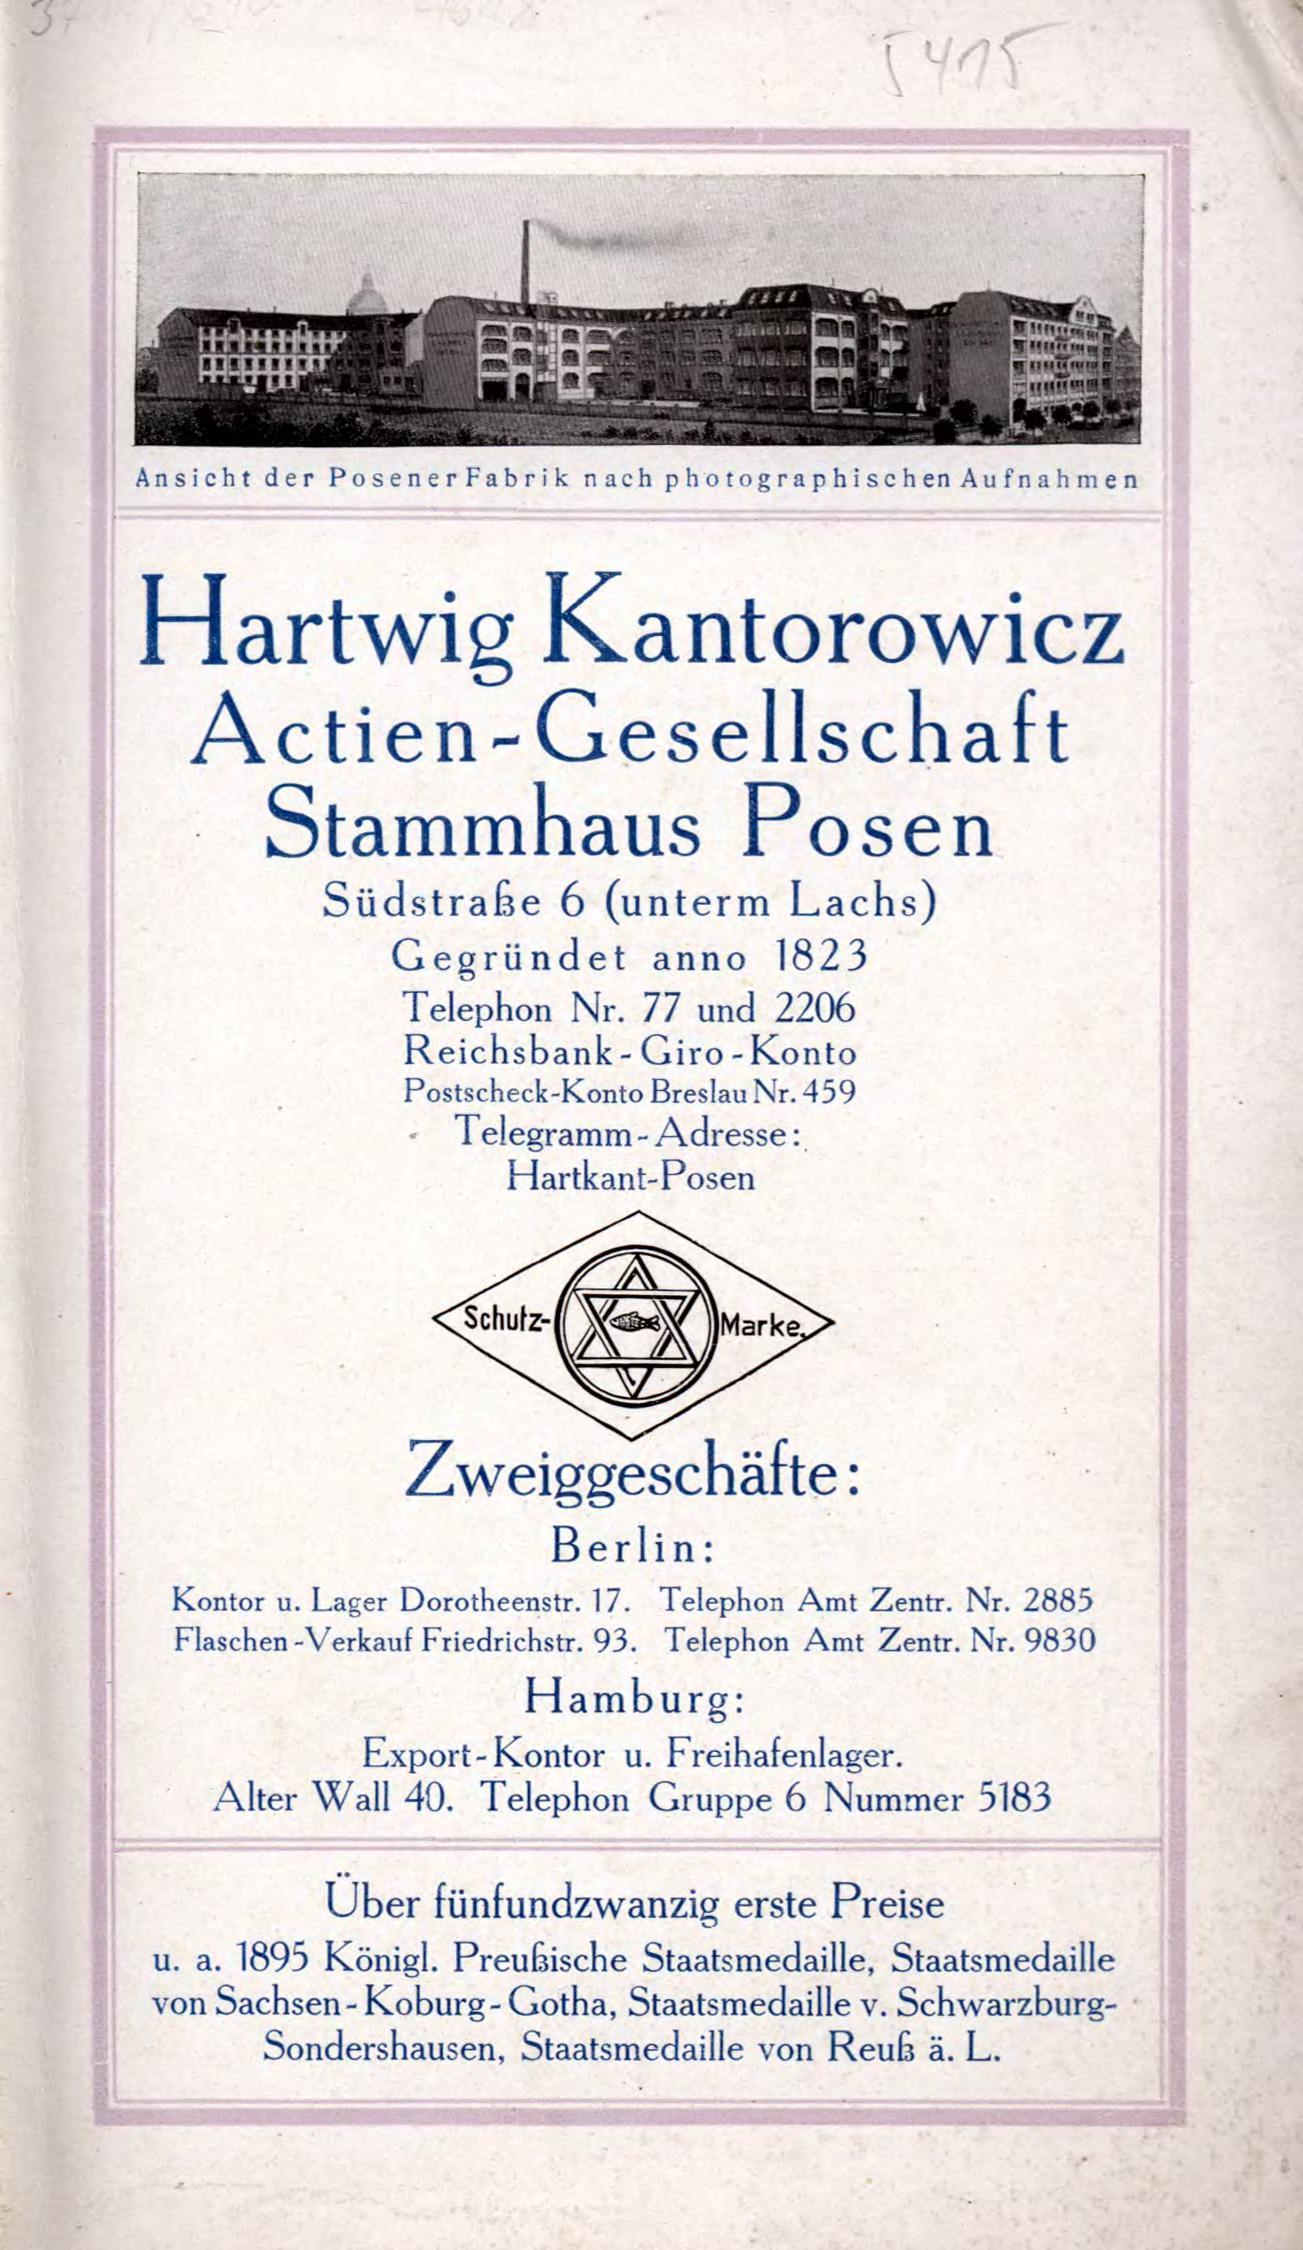 https://vignette.wikia.nocookie.net/poznan/images/1/1b/Hartwig-kantorowicz_1.jpg/revision/latest?cb=20120329141138&path-prefix=pl